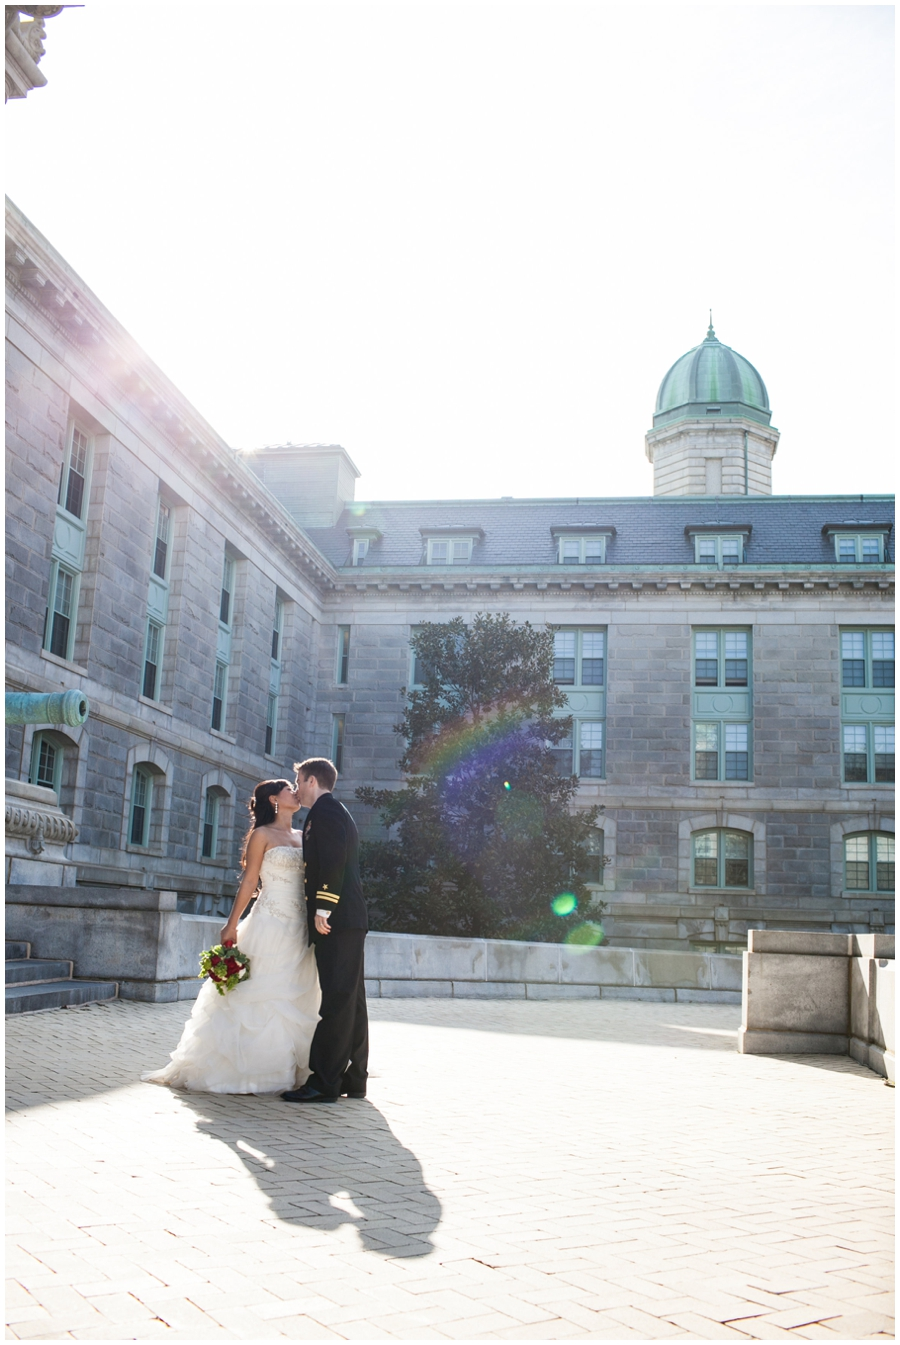 Naval Academy Wedding Photo - Best wedding photographs of 2013